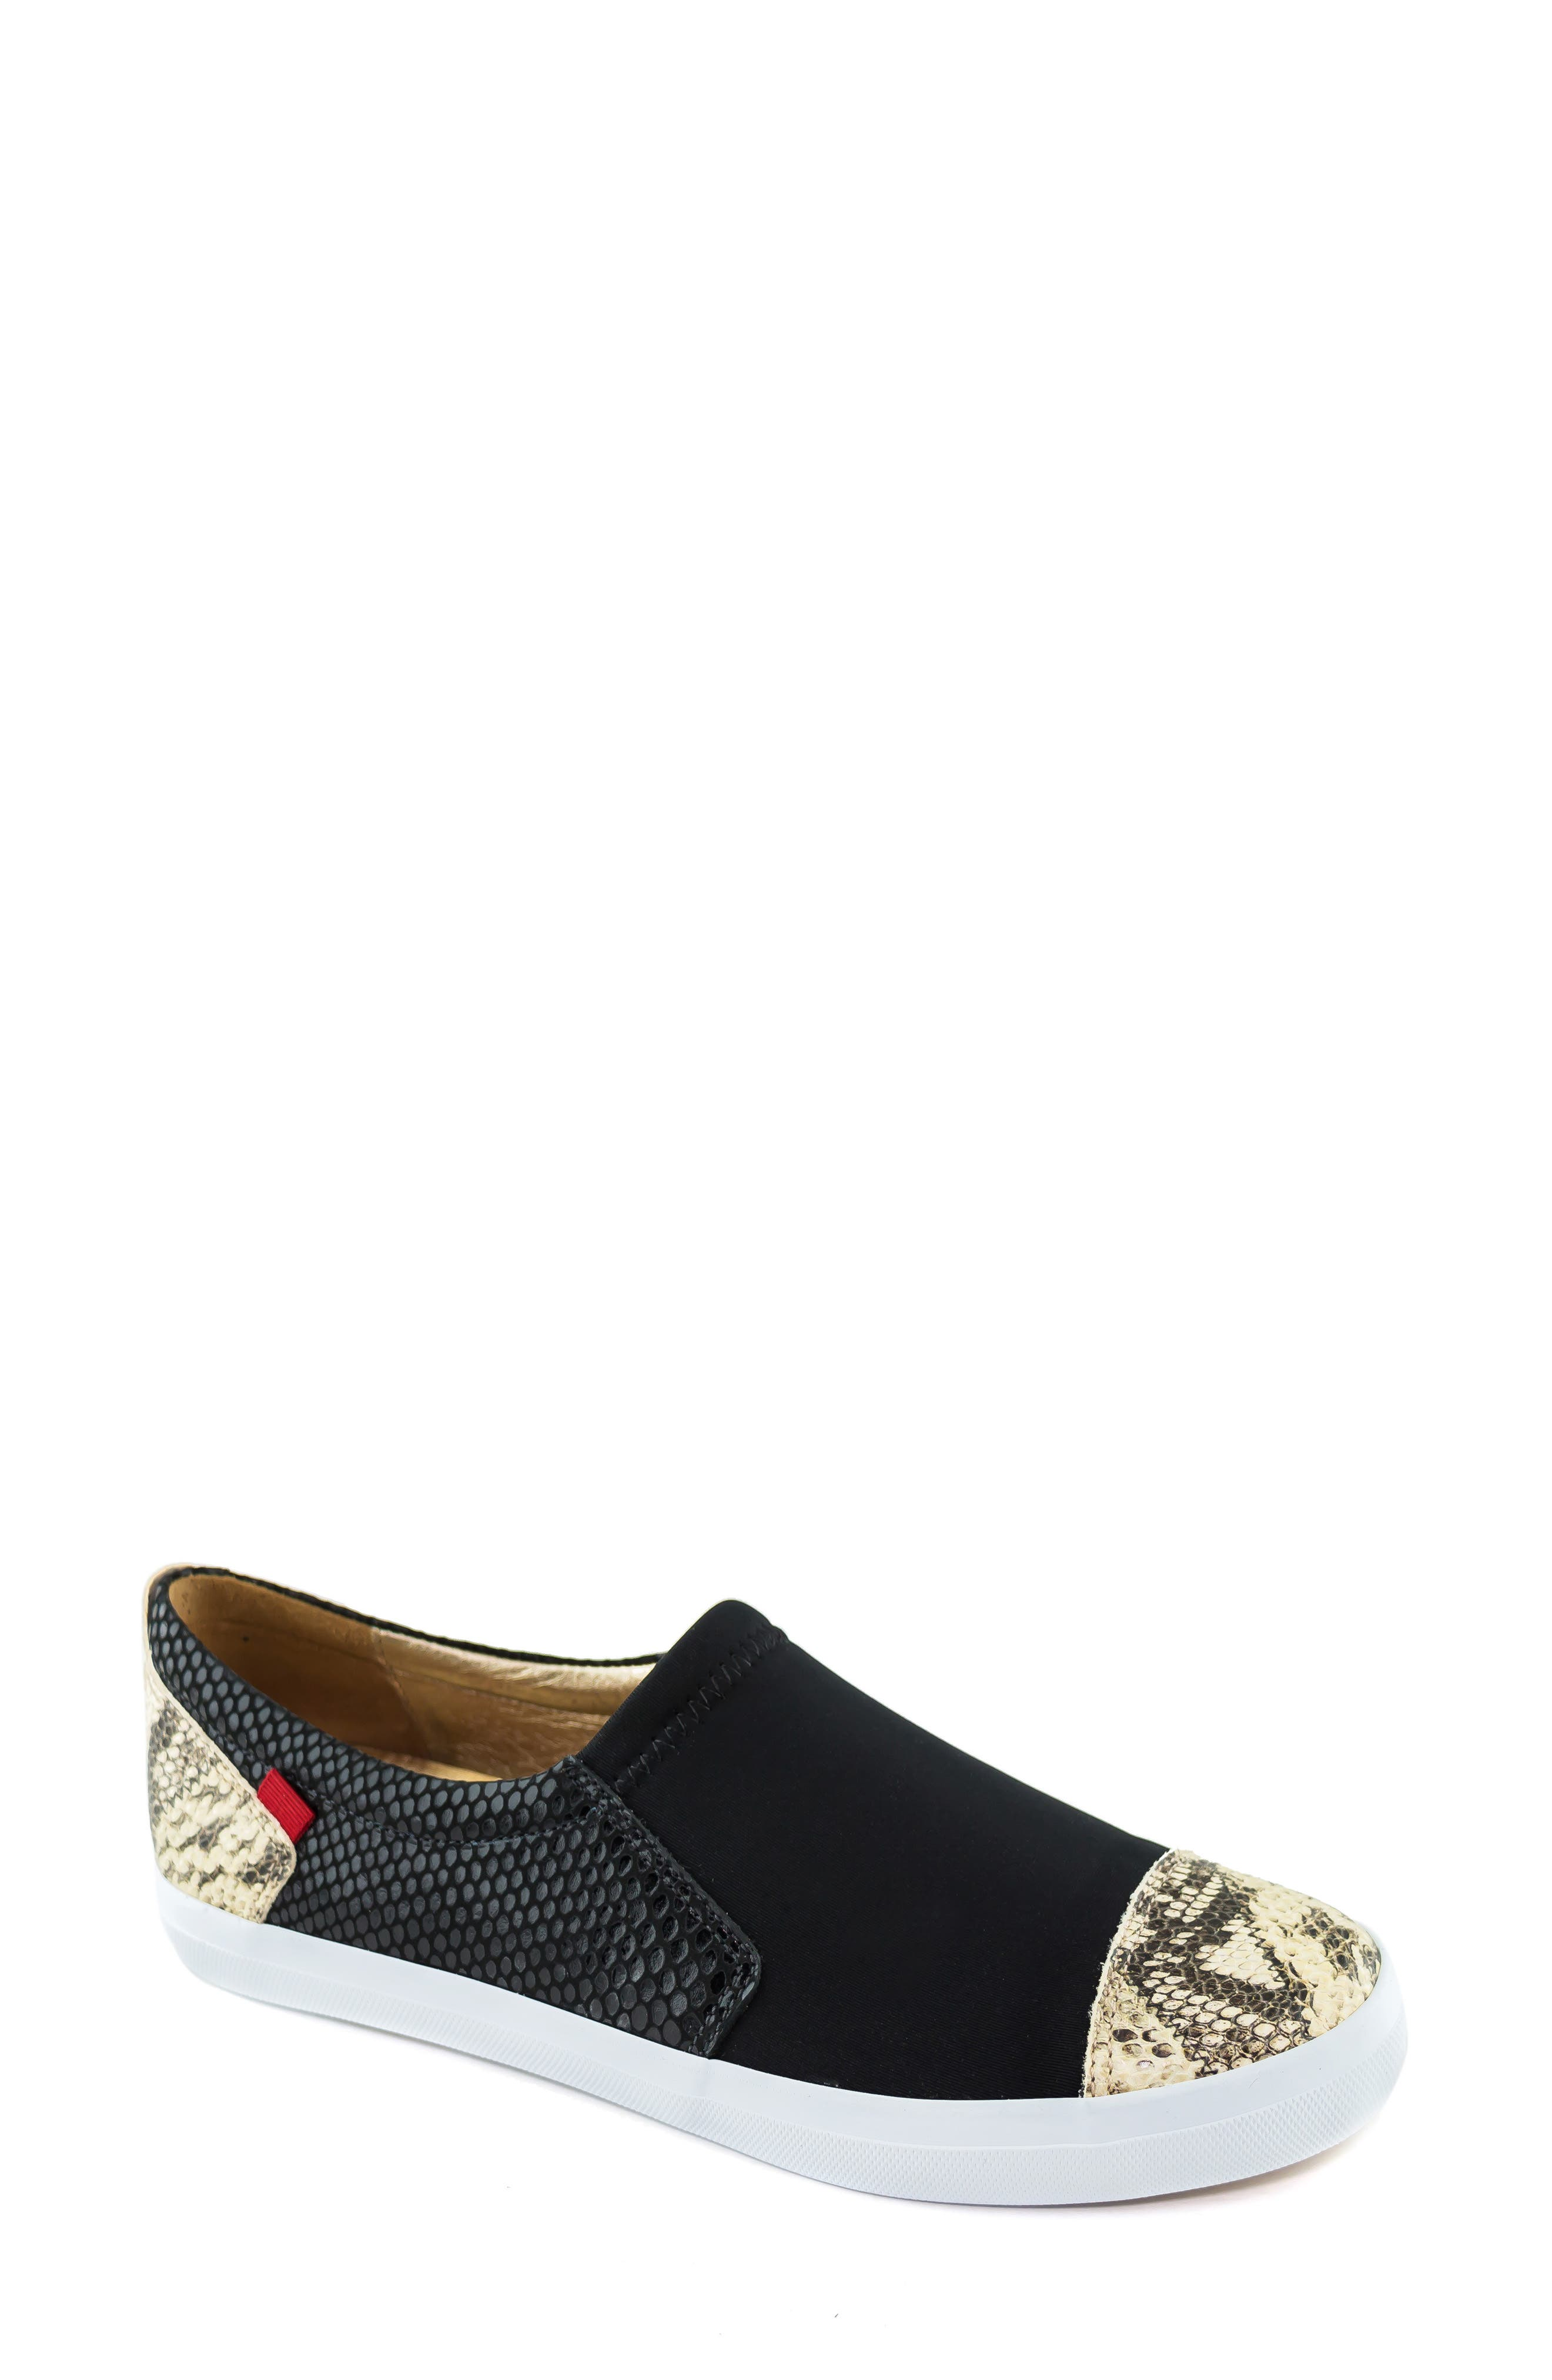 MARC JOSEPH NEW YORK Jay Street Sneaker, Main, color, BLACK PATCHWORK